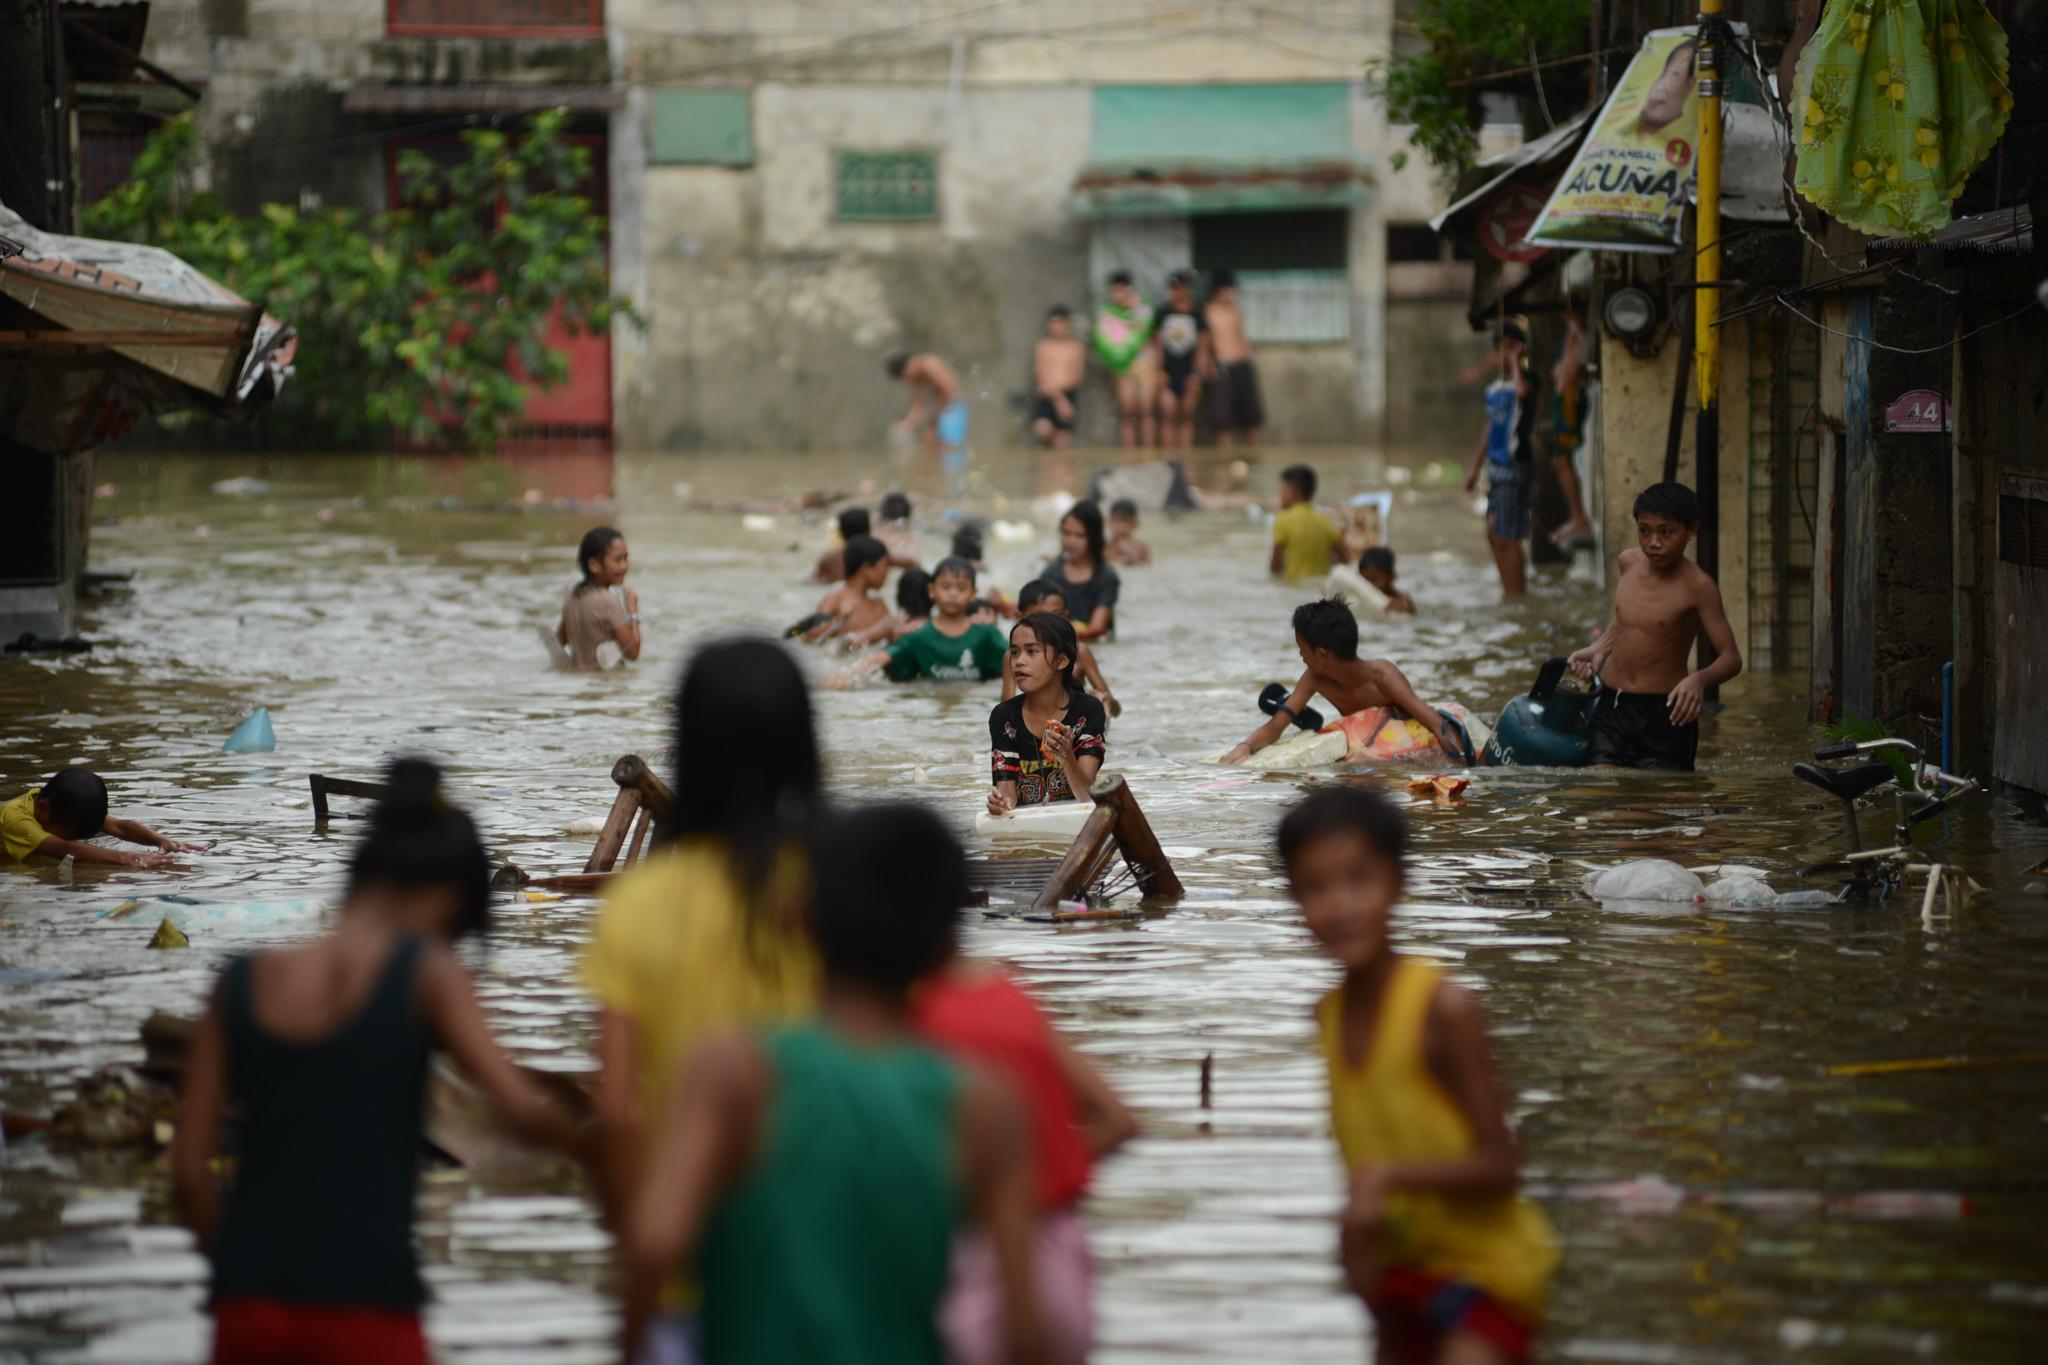 FLOOD. This file photo shows waist-deep flooding in Marikina on August 2016. File Photo by Martin San Diego/Rappler